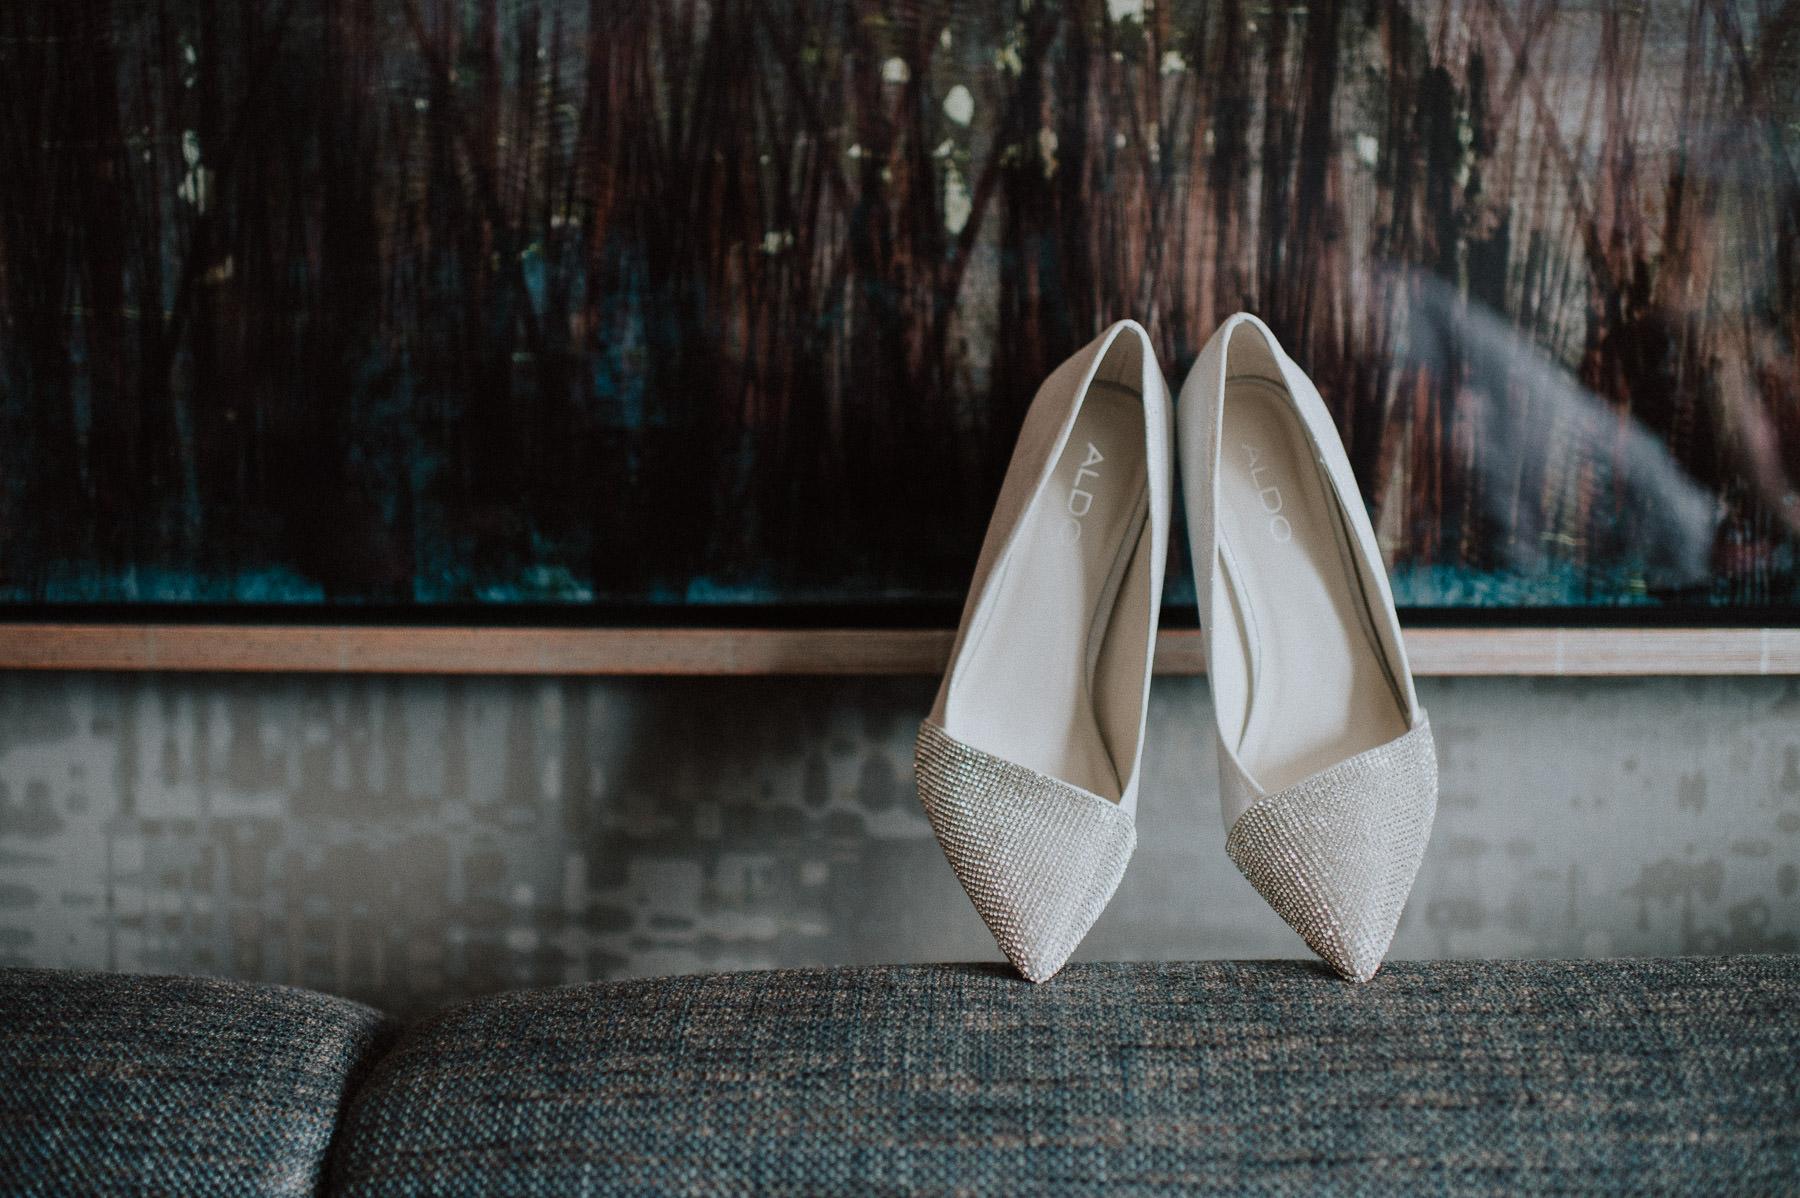 appleford-estate-wedding-photography-2.jpg